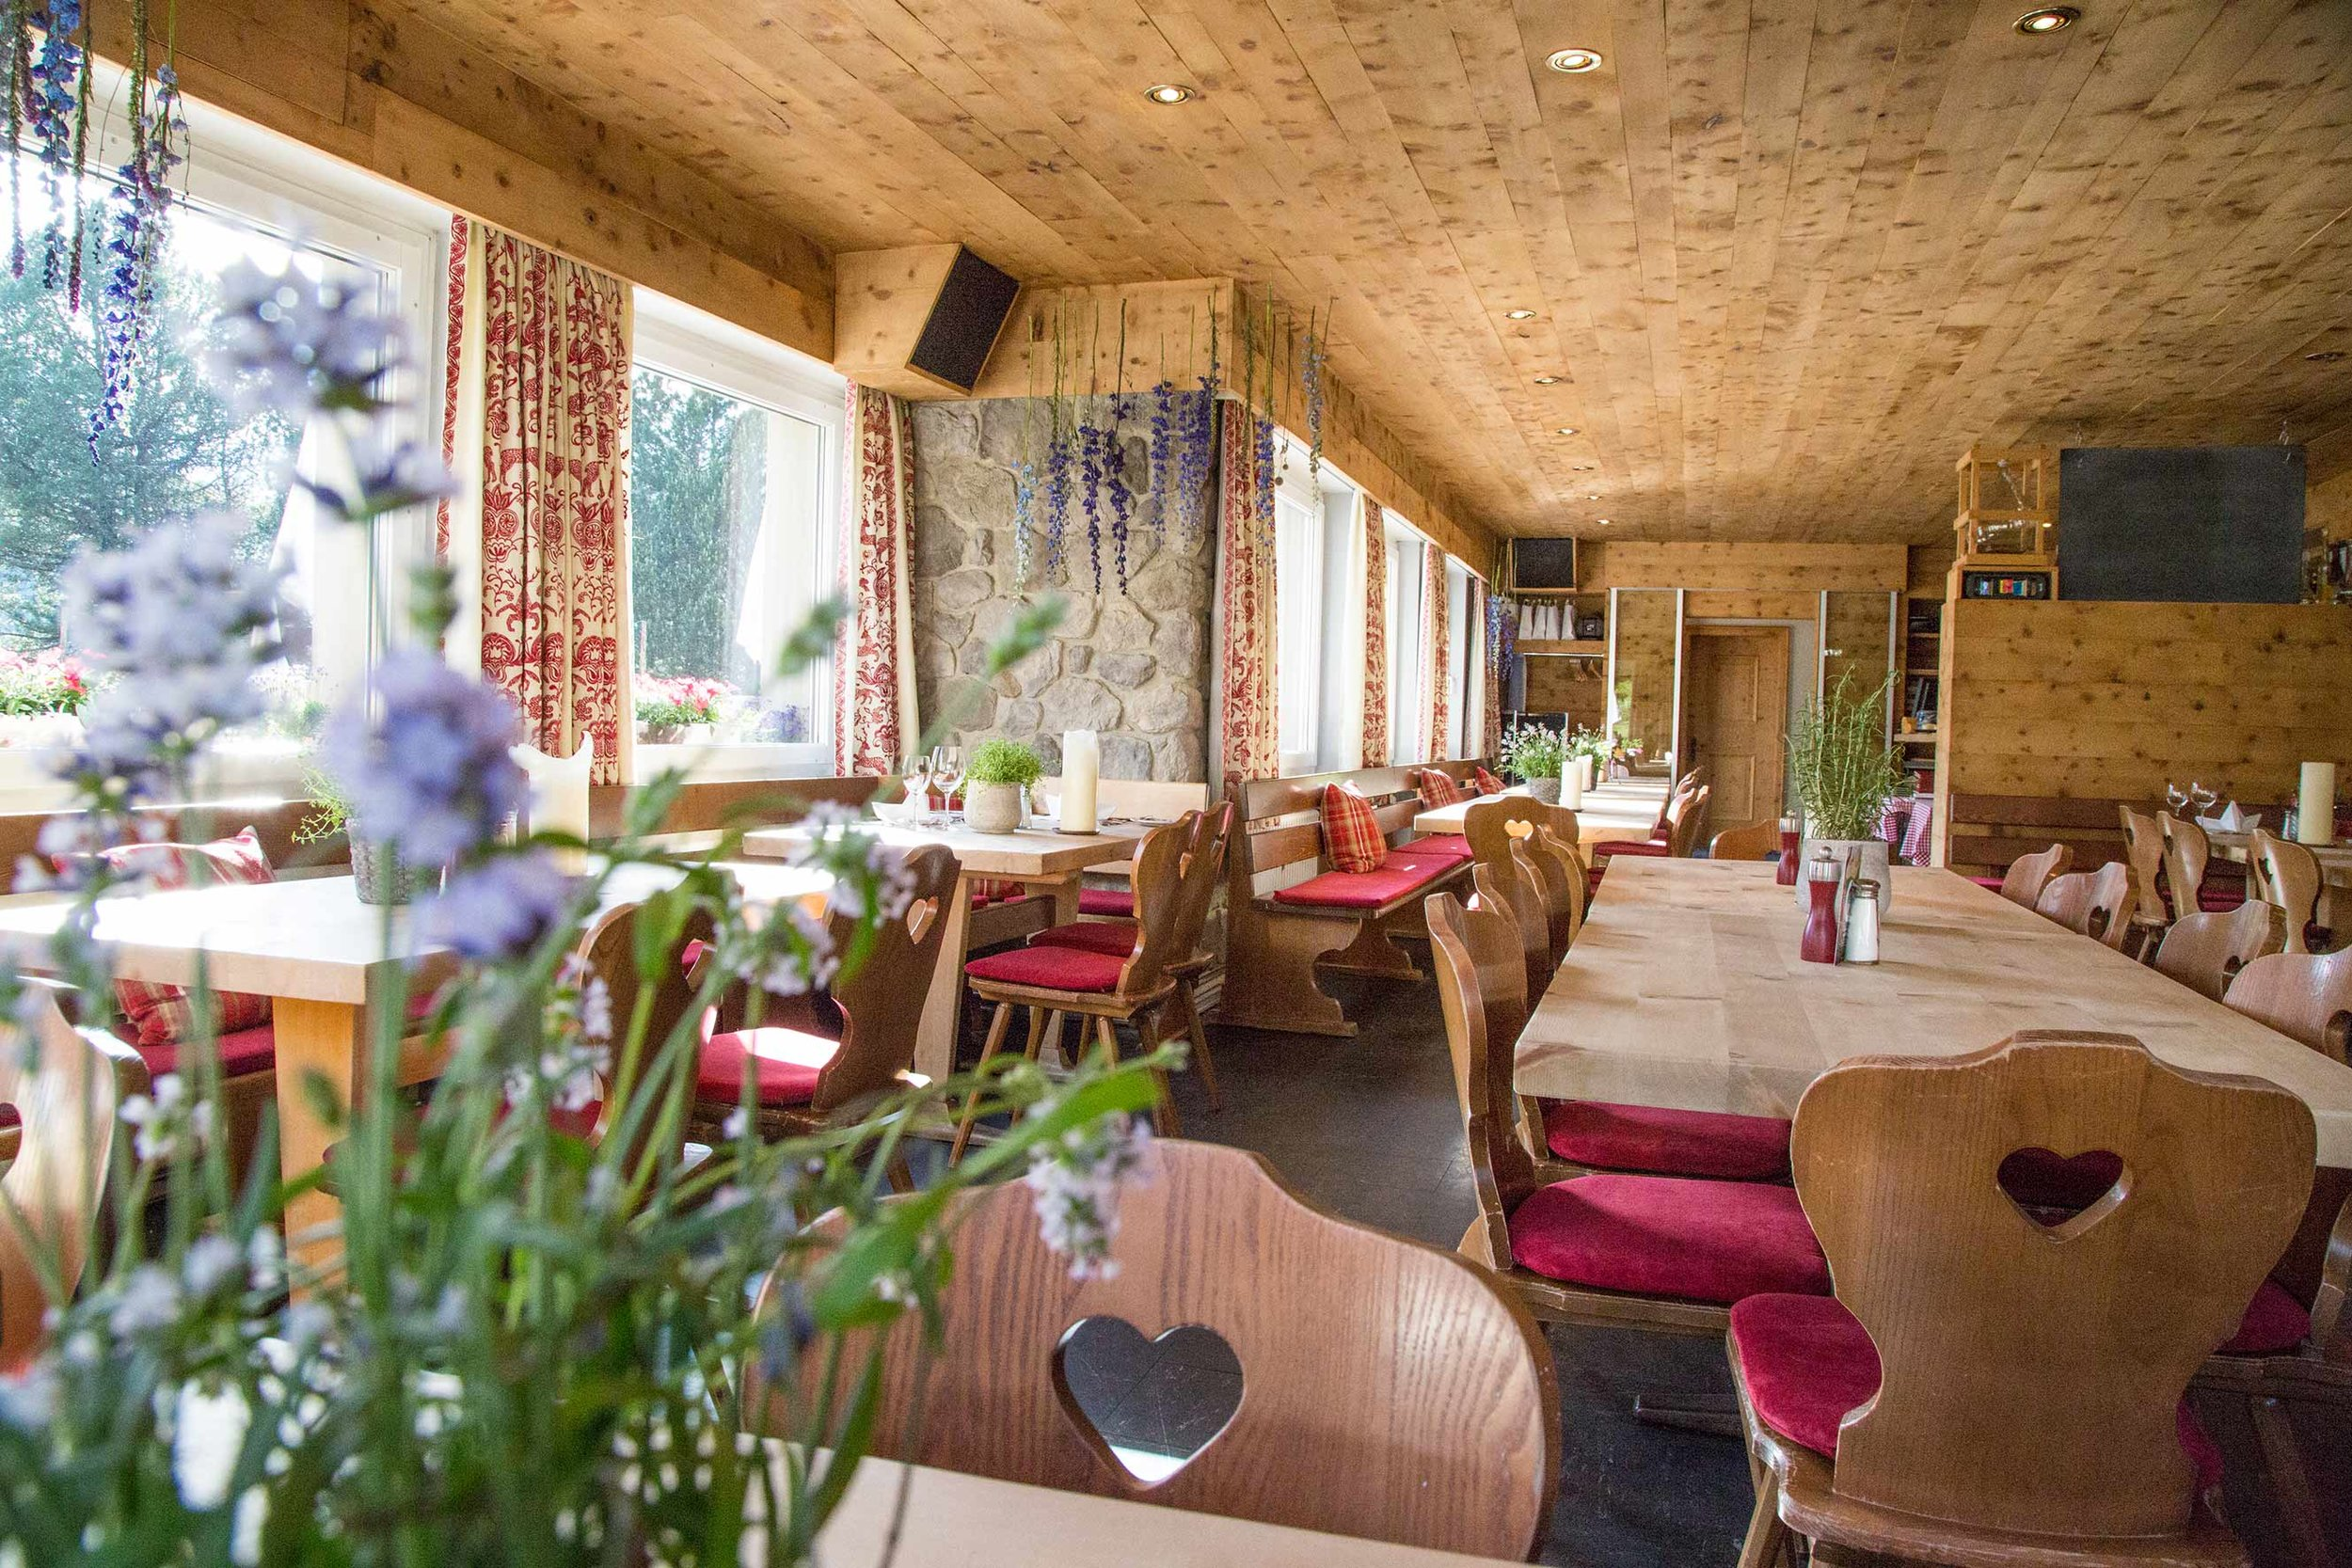 lejdastaz-restorant-am-tag.jpg